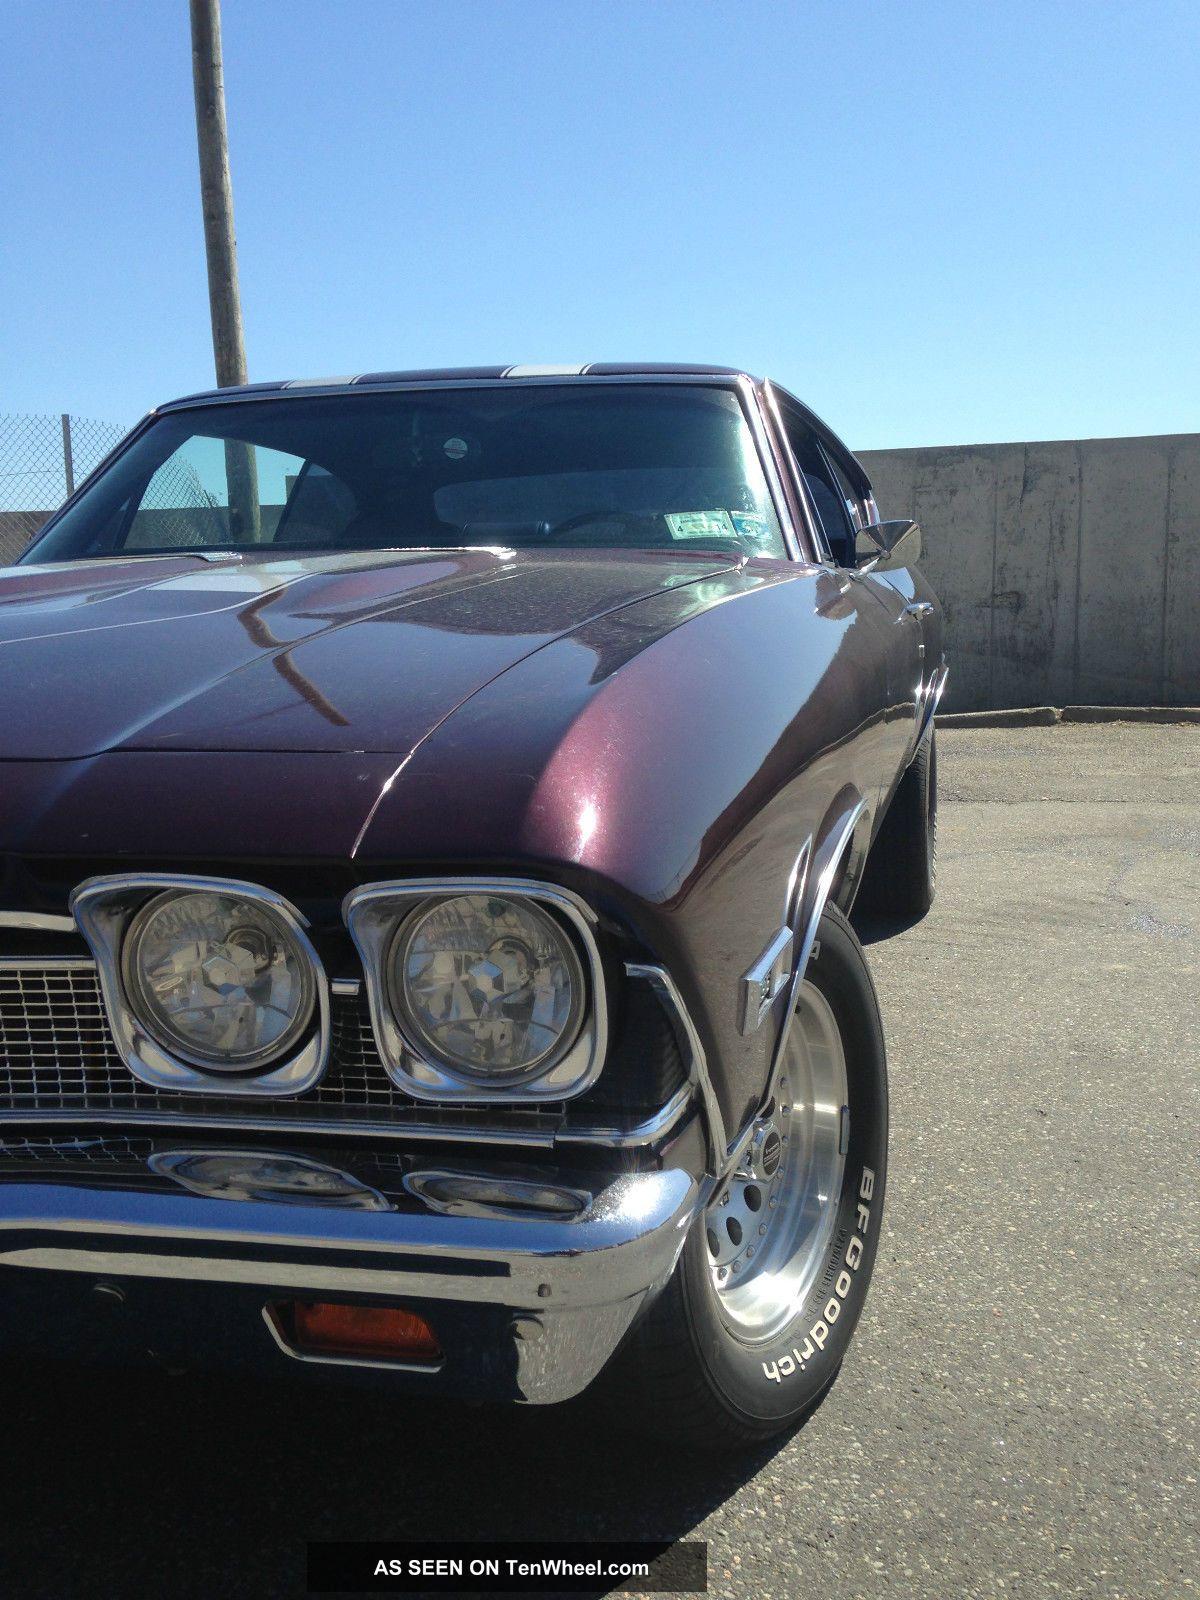 1968 68 Chevy Chevelle True Ss 454 Big Block Hard Top